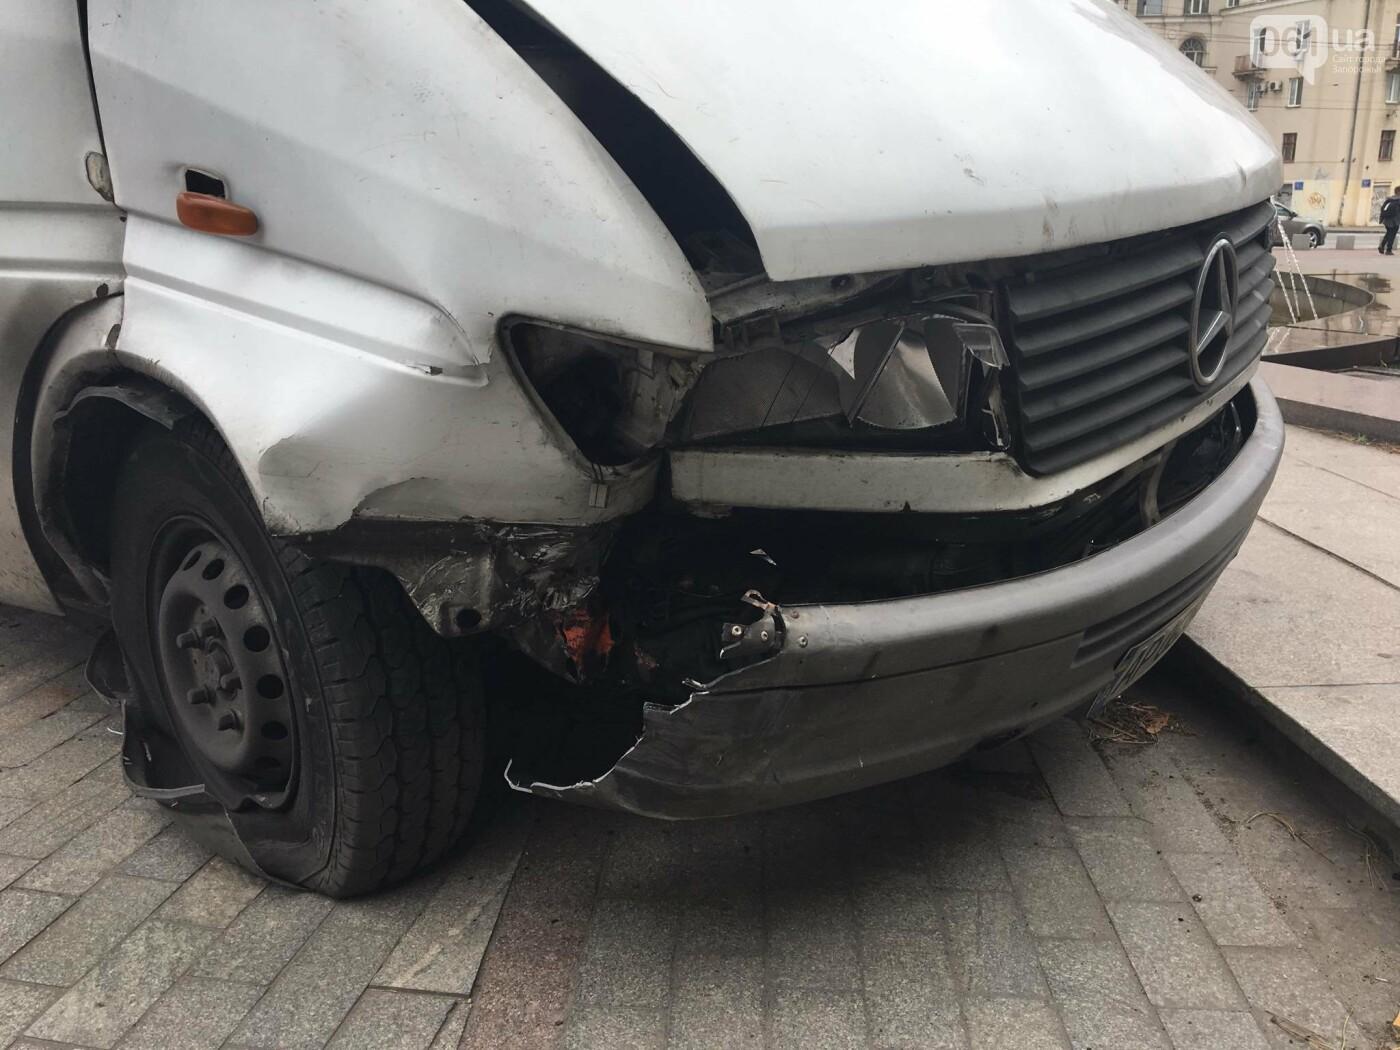 В центре Запорожья маршрутка попала в ДТП: пассажирку госпитализировали, - ФОТО, ВИДЕО, фото-5